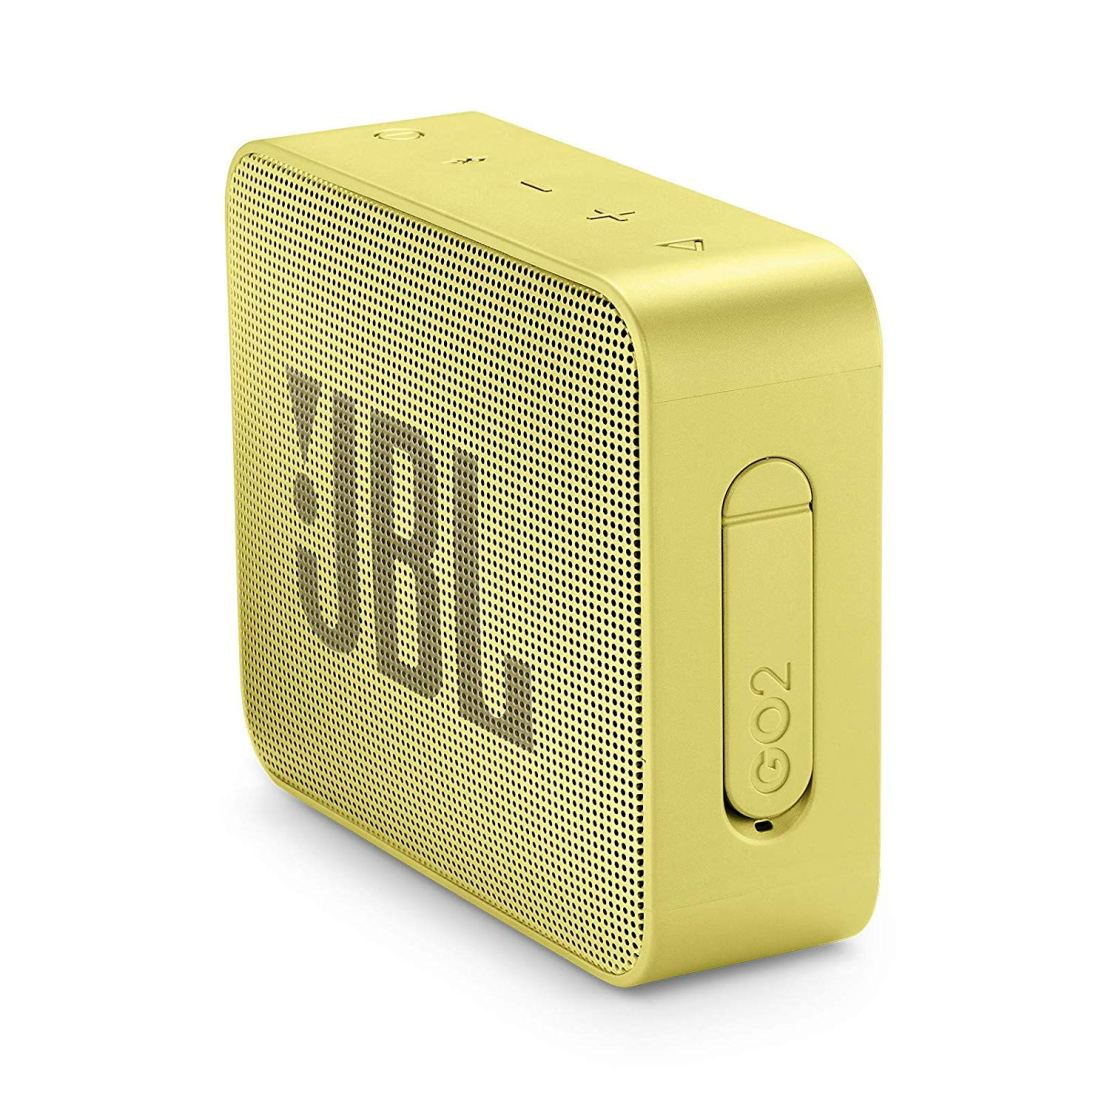 altavoz Bluetooth portátil de JBL